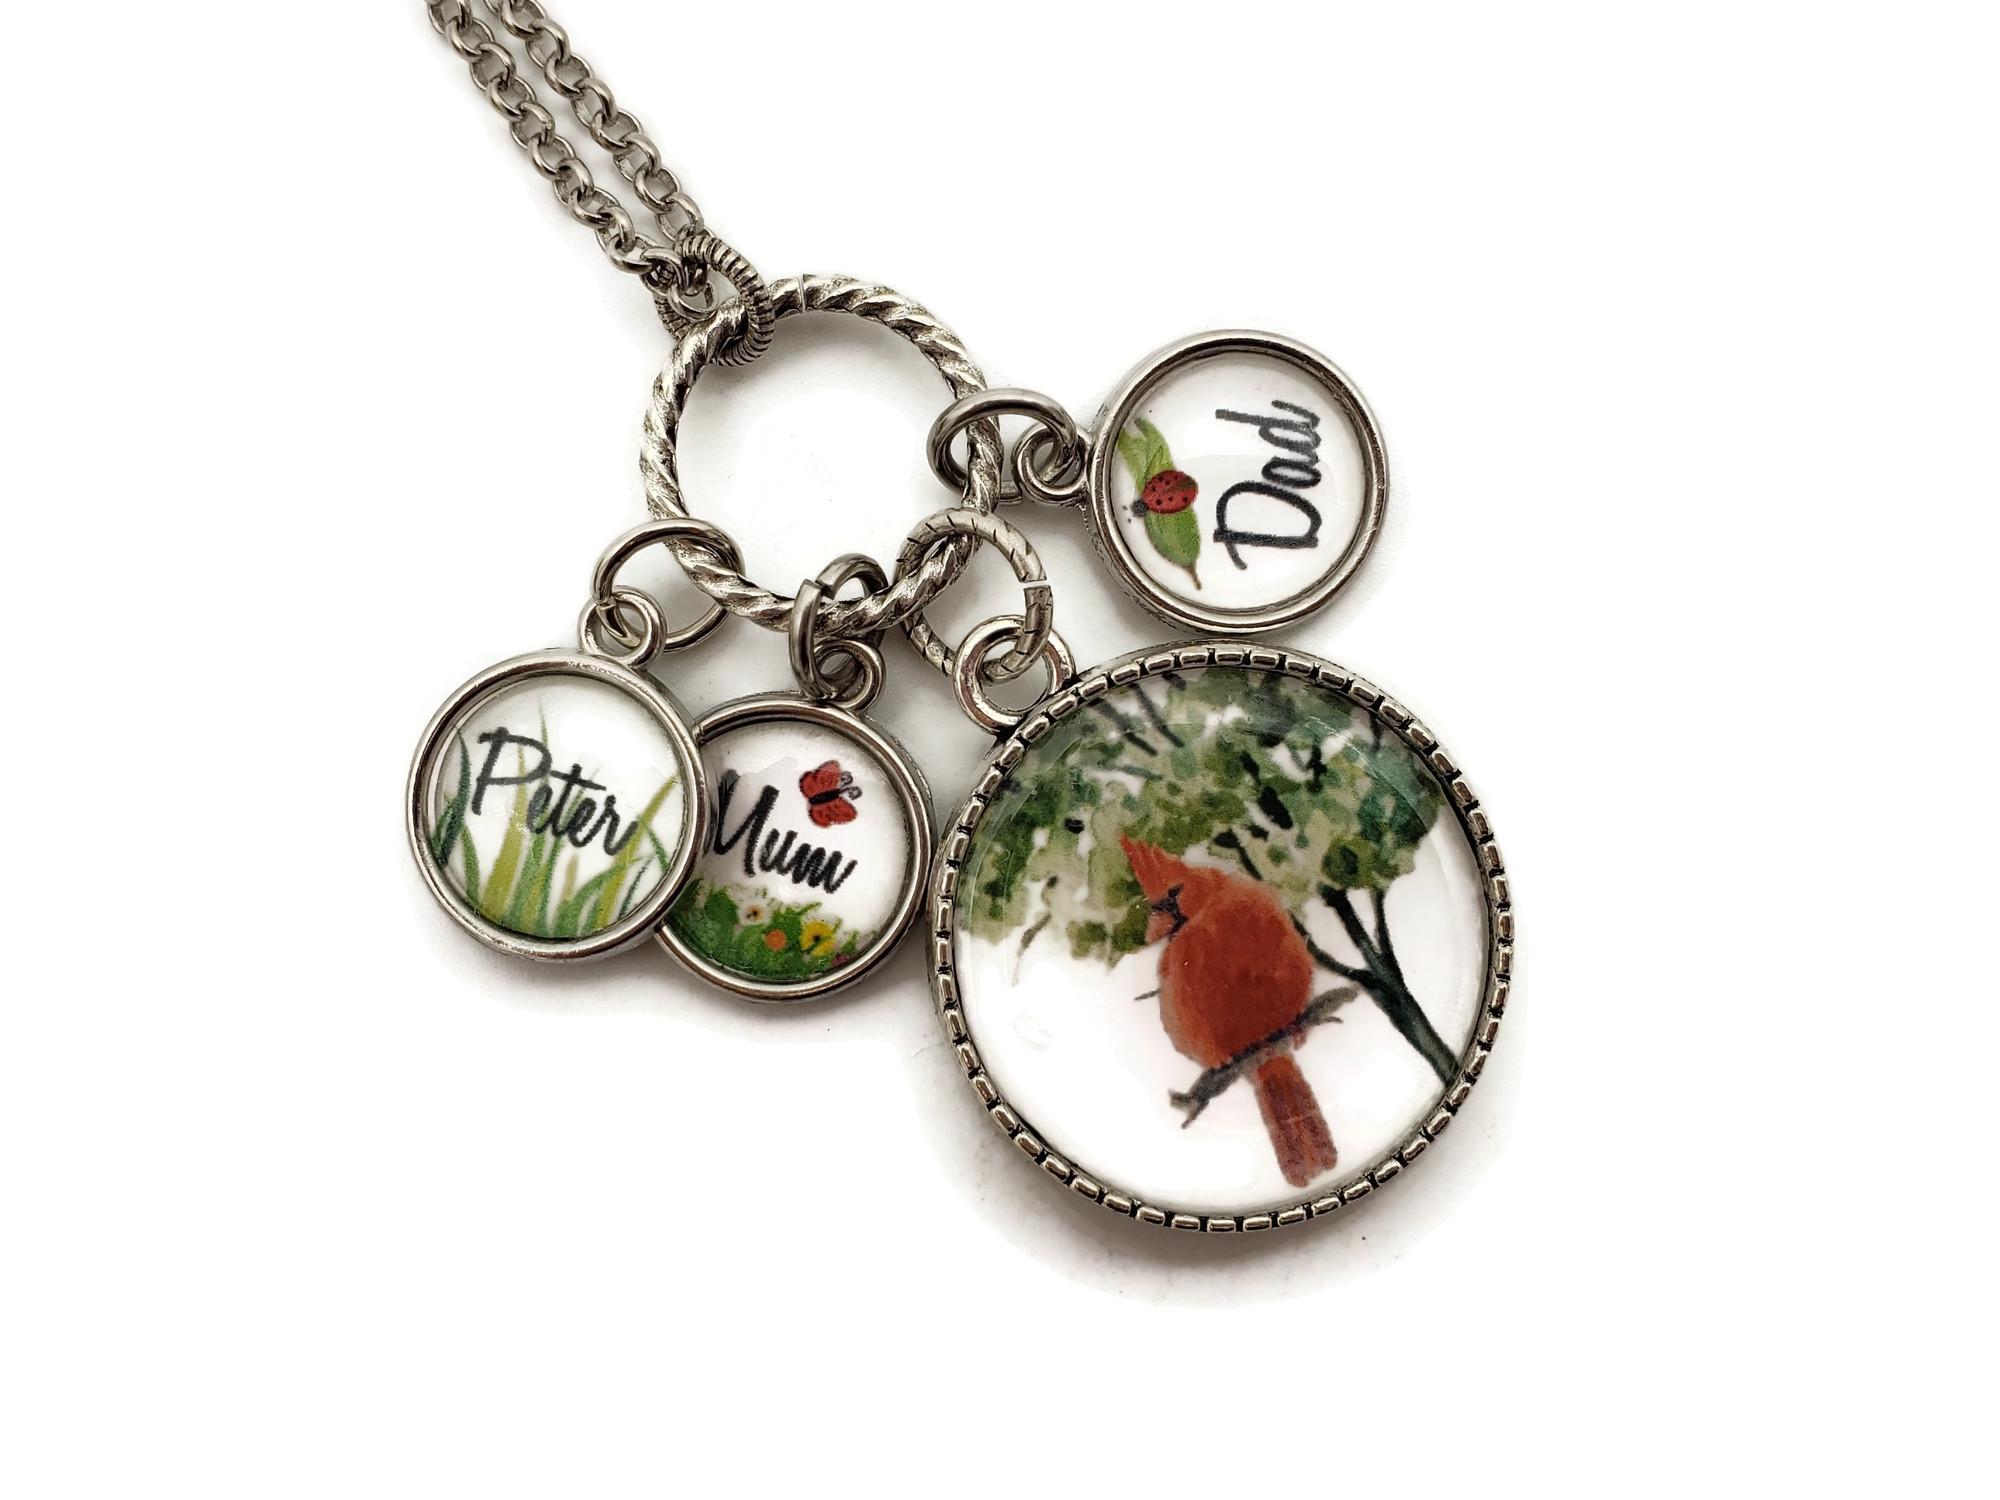 Cardinal Gifts - When a Cardinal Appears - Cardinal Memorial Necklace